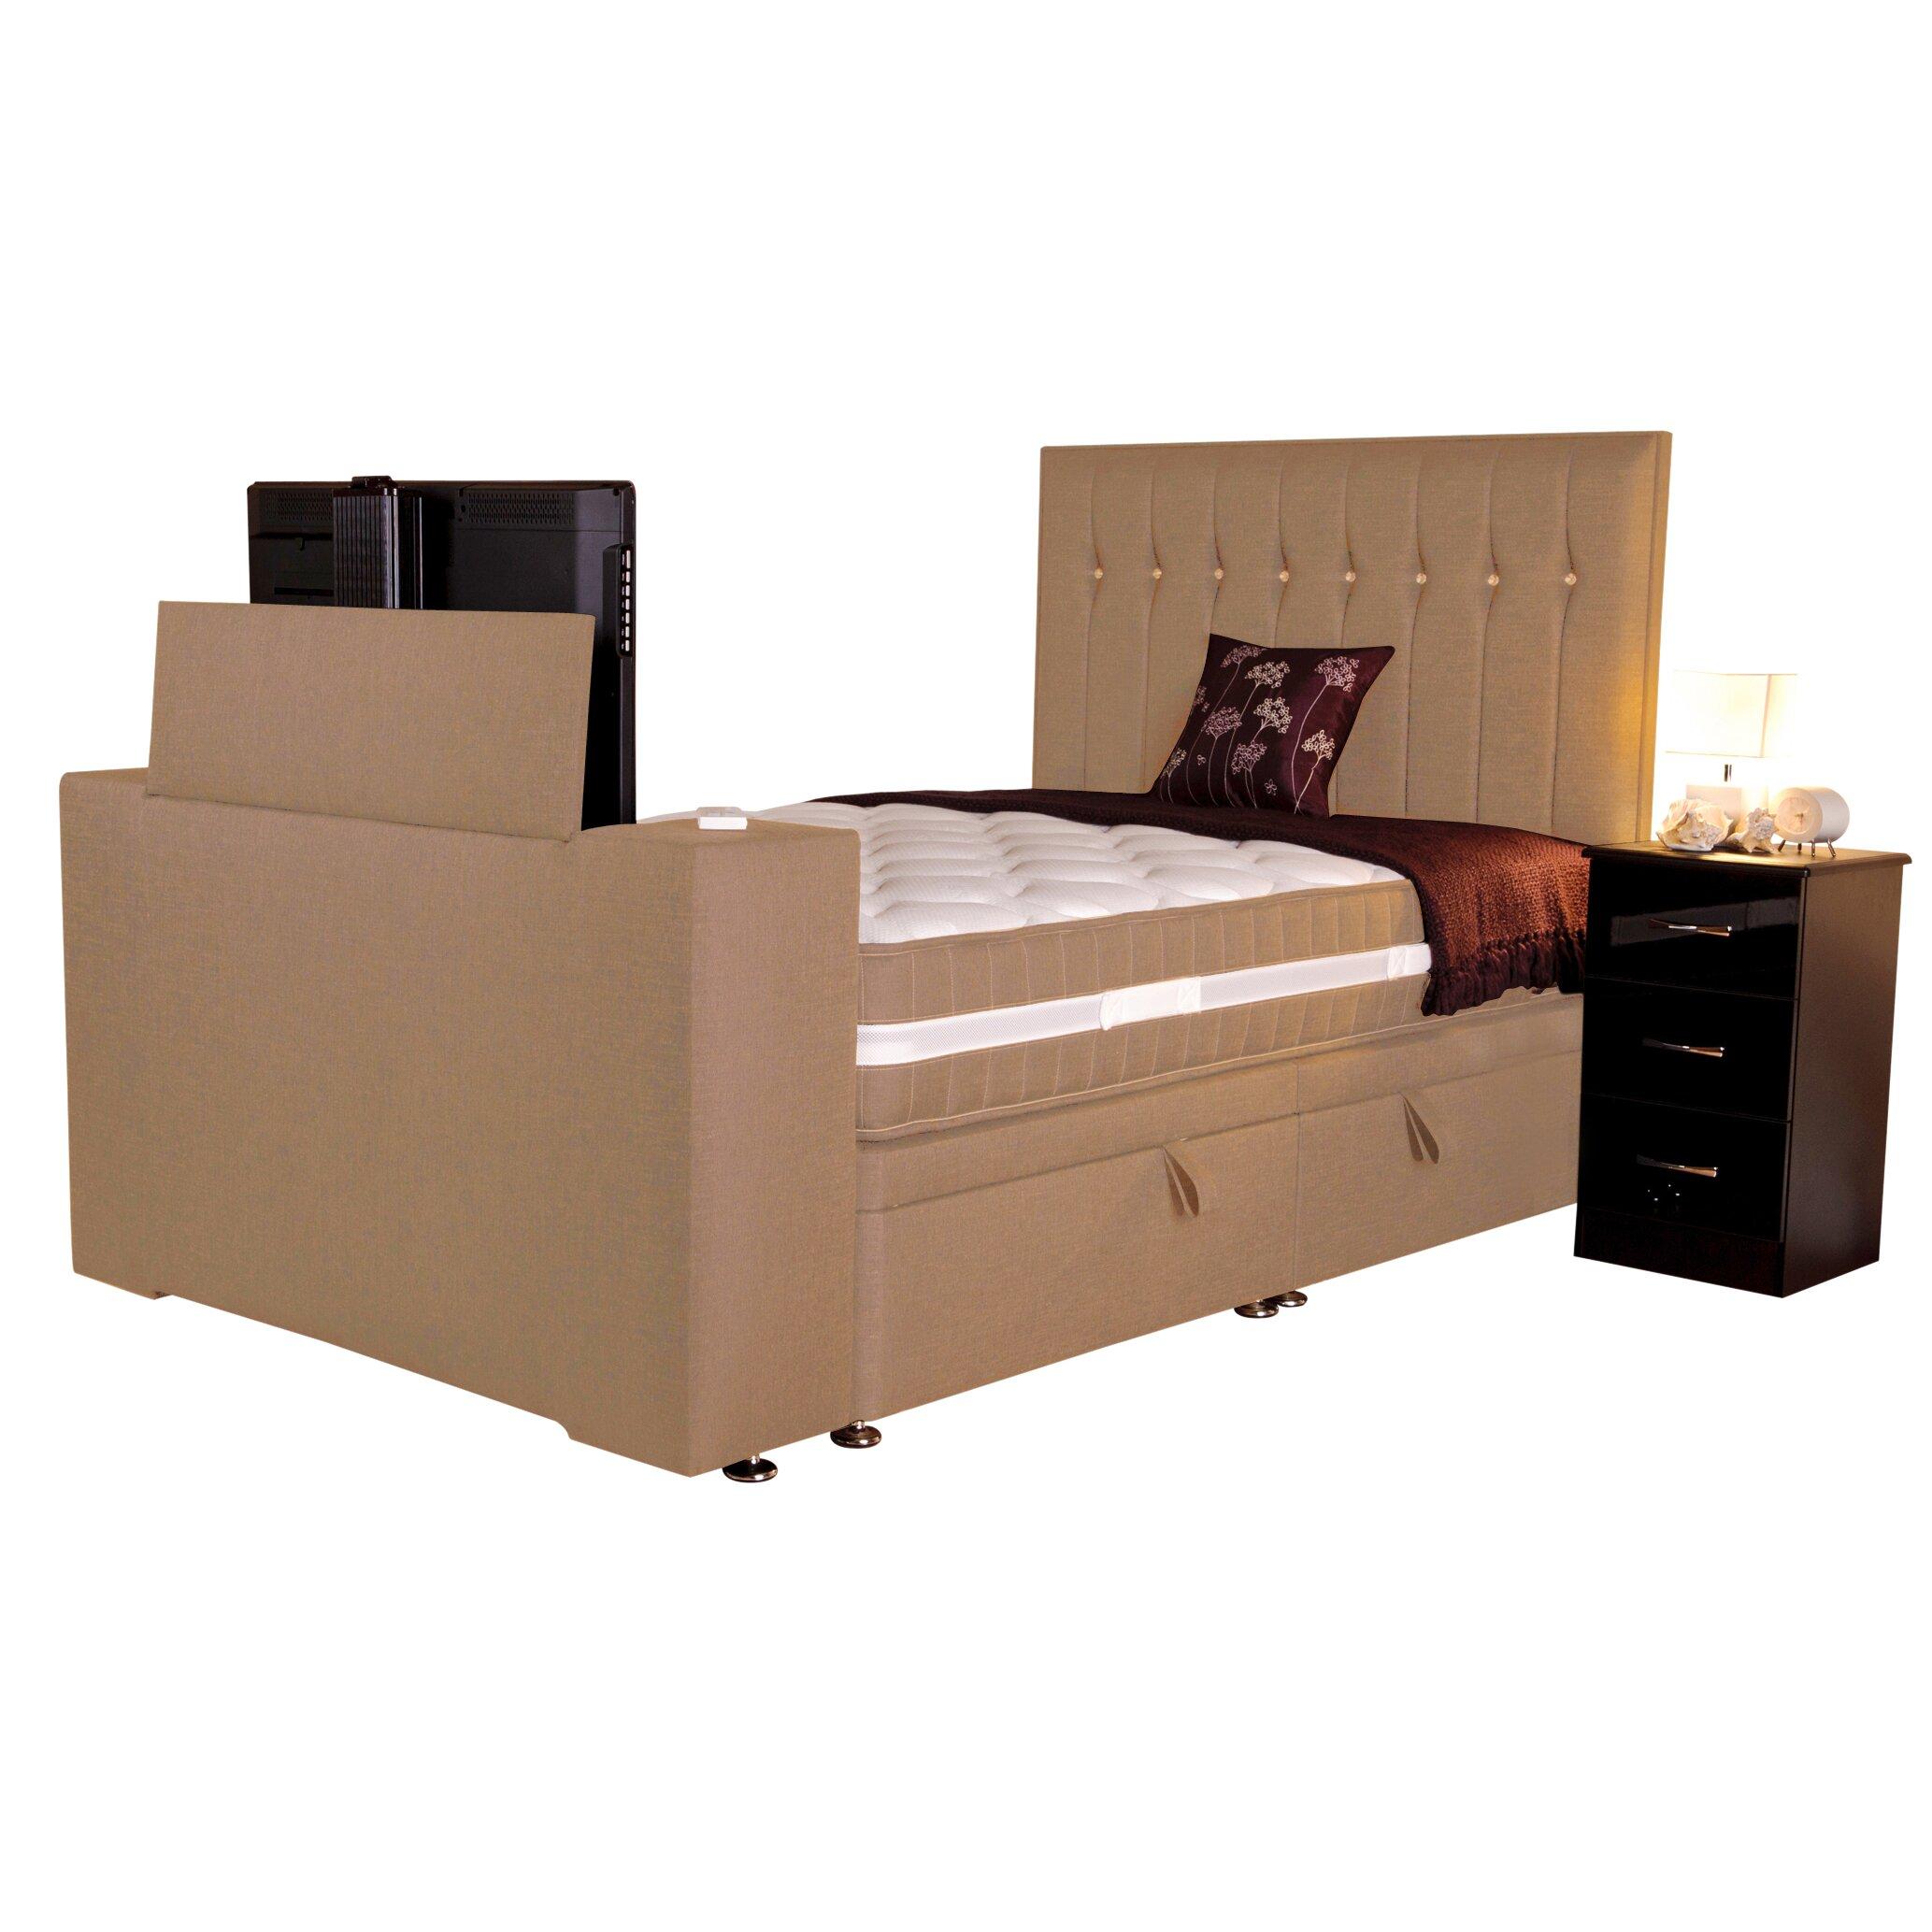 Sweet Dreams Divan Bed Wayfair Uk